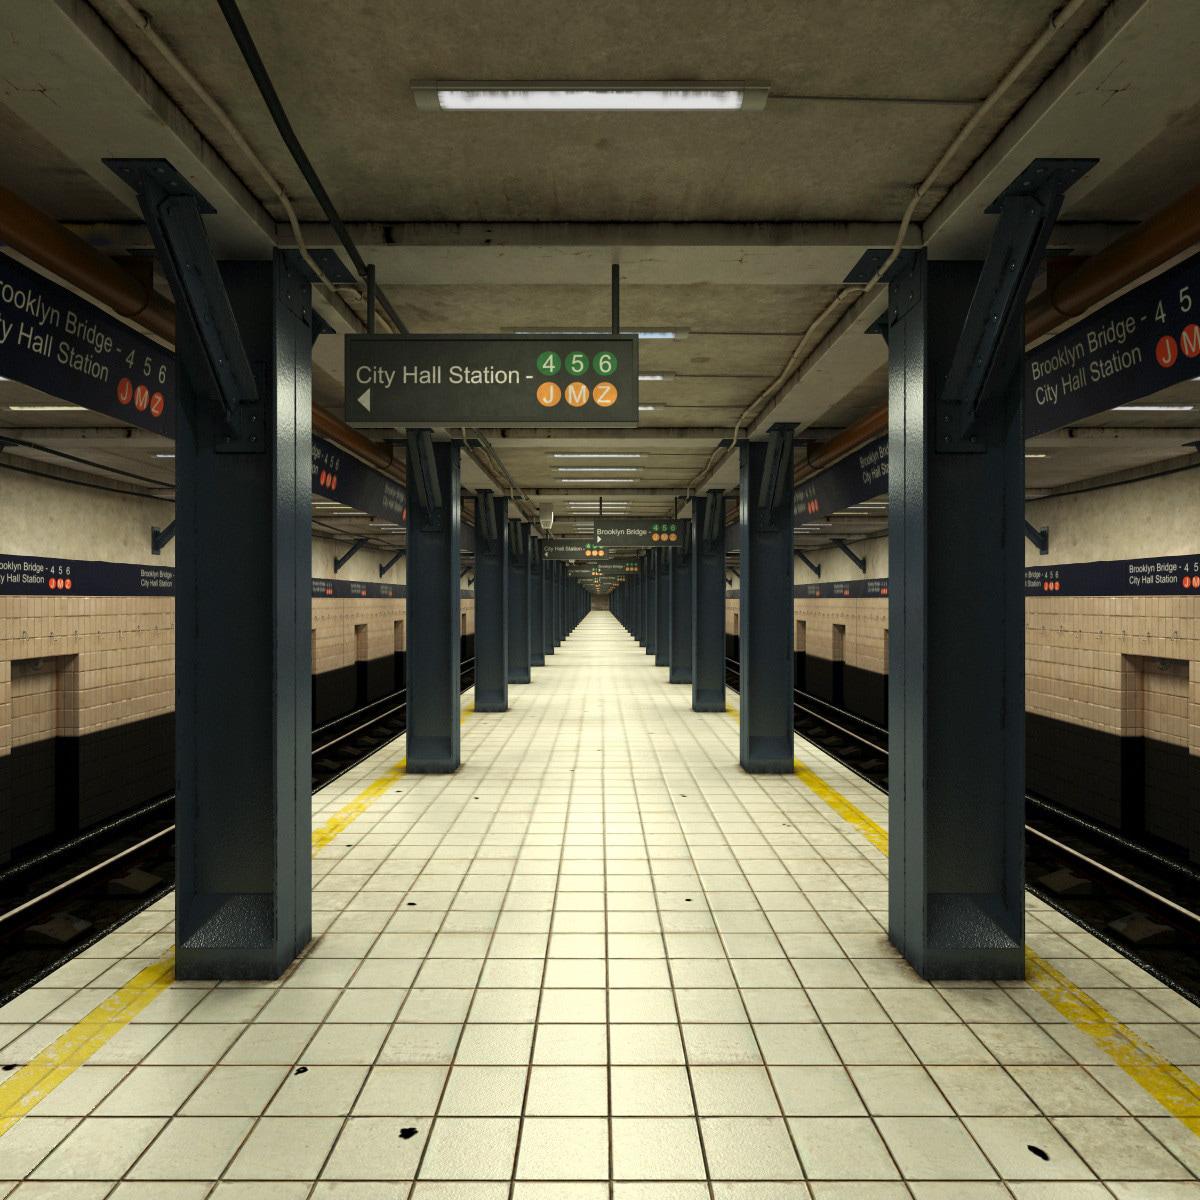 Subway_Station_V2_000.jpg762b0e10-07f7-457d-b37e-9885f767ee44Original.jpg